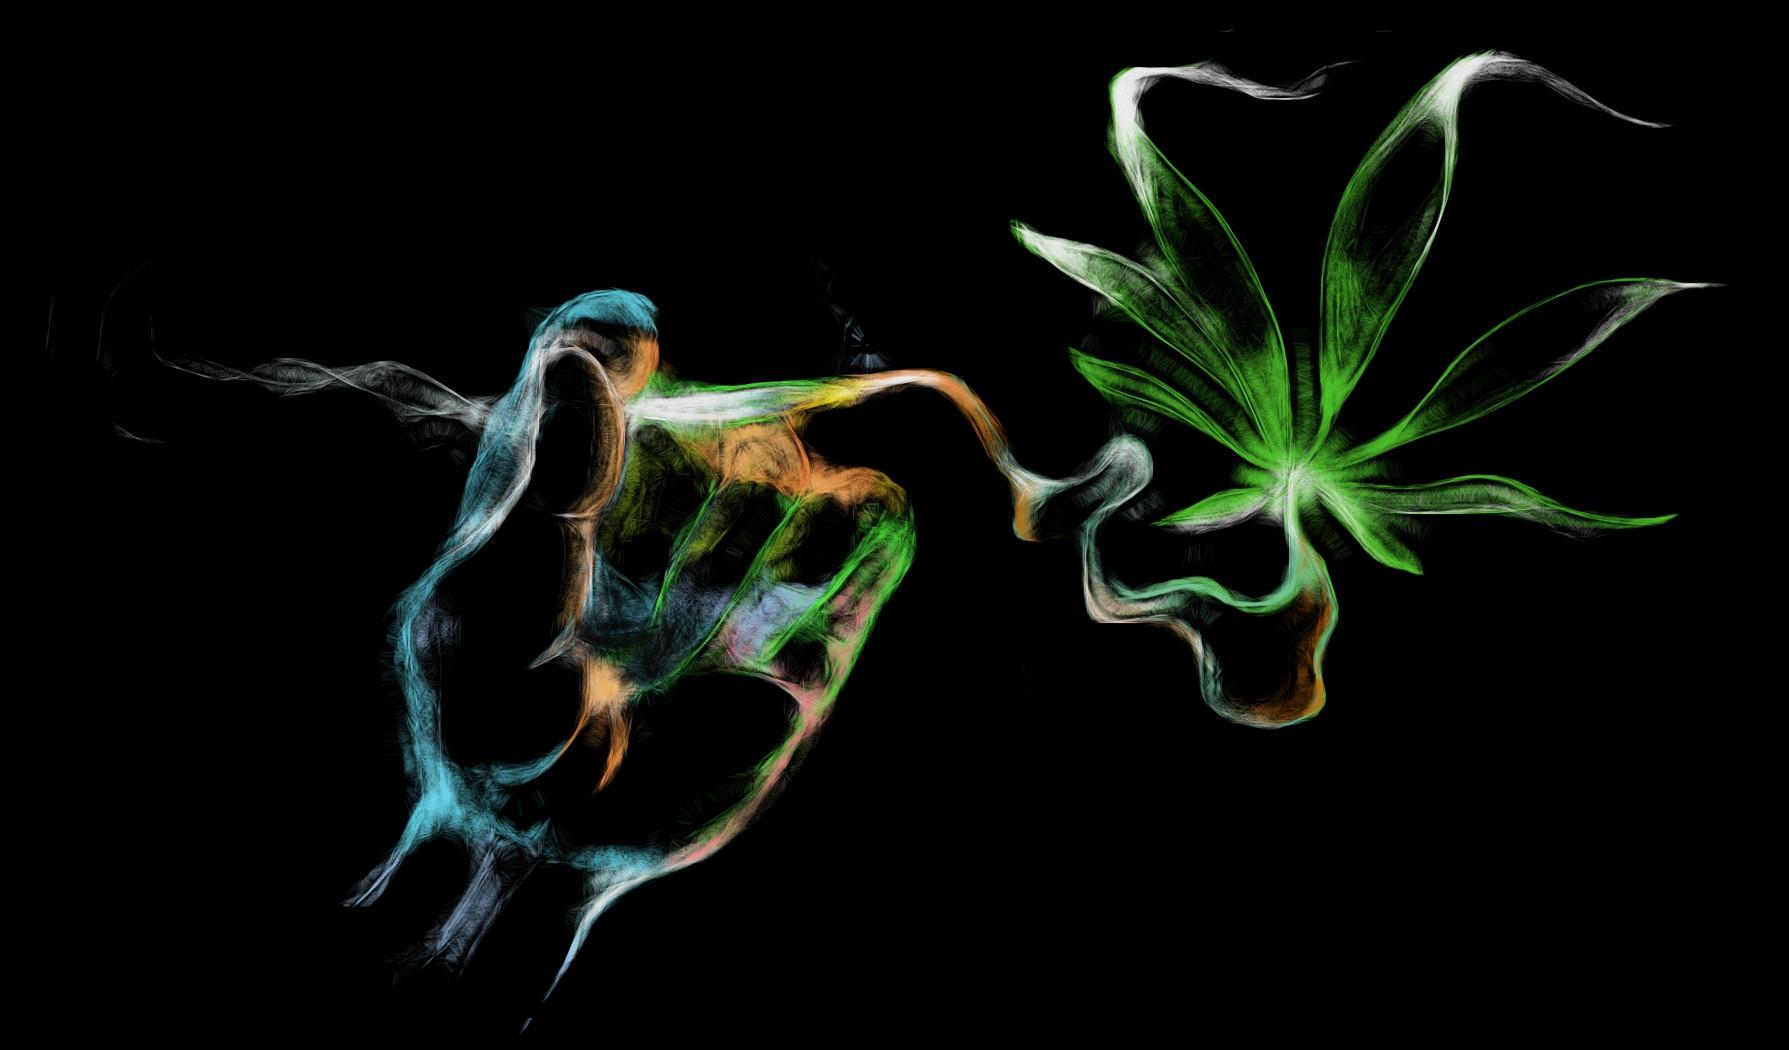 Wallpapers Smoking Weed 1789x1050